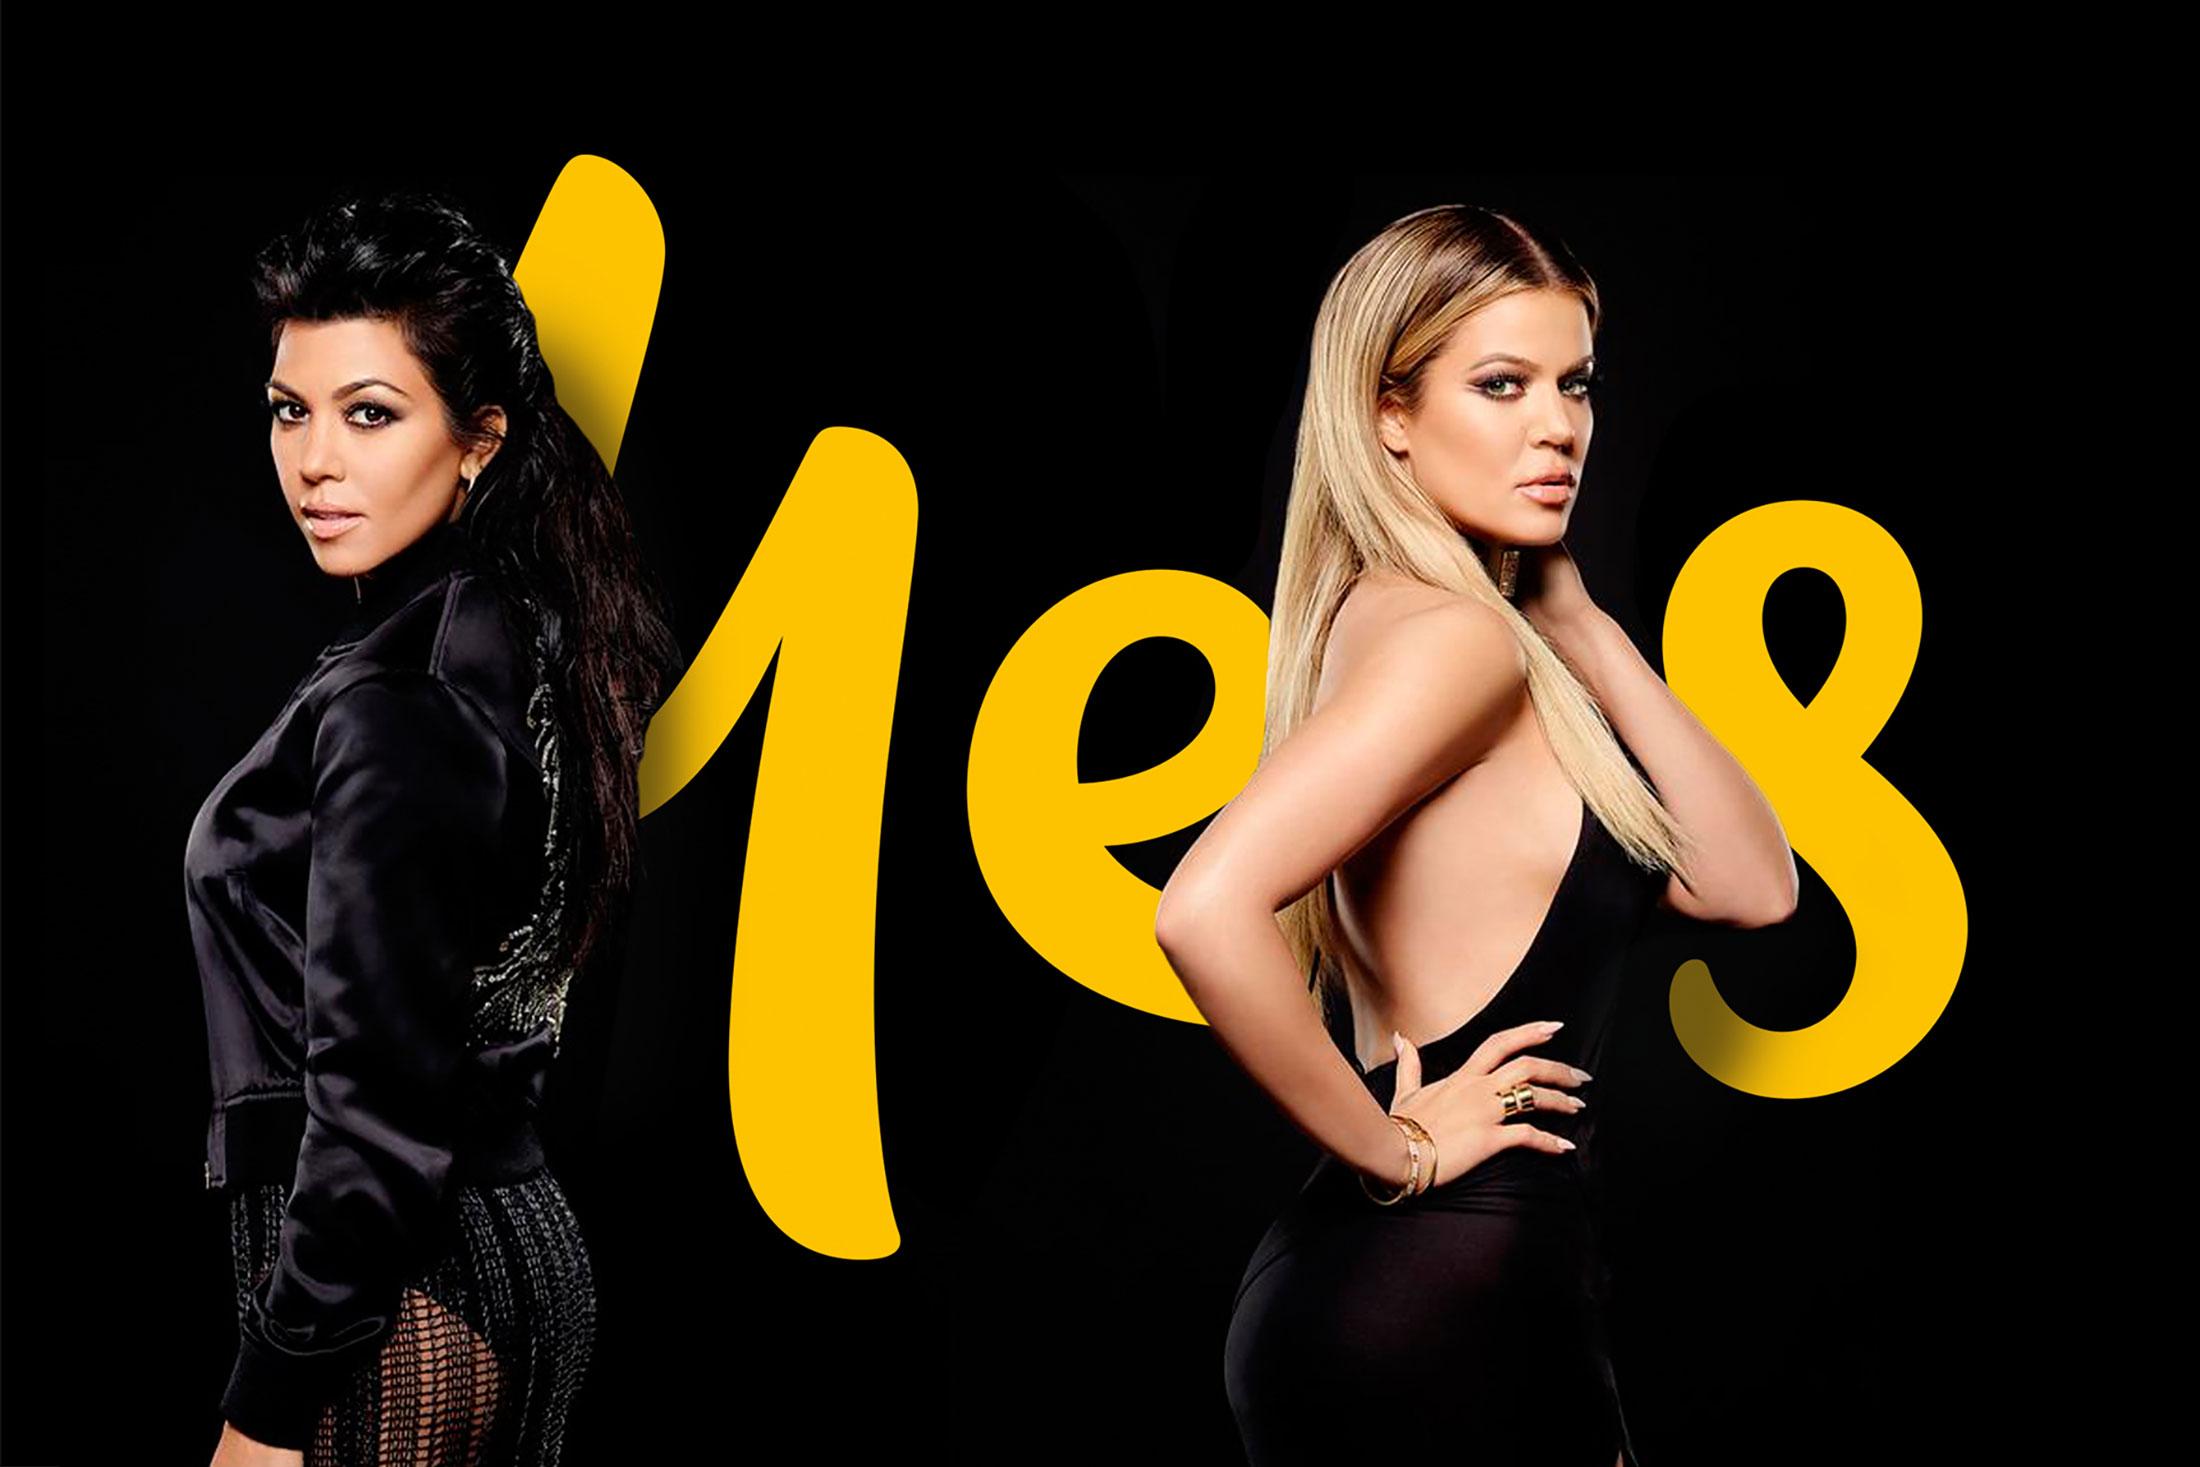 Optus-Identity-Yes-Mark-Kardashian.jpg